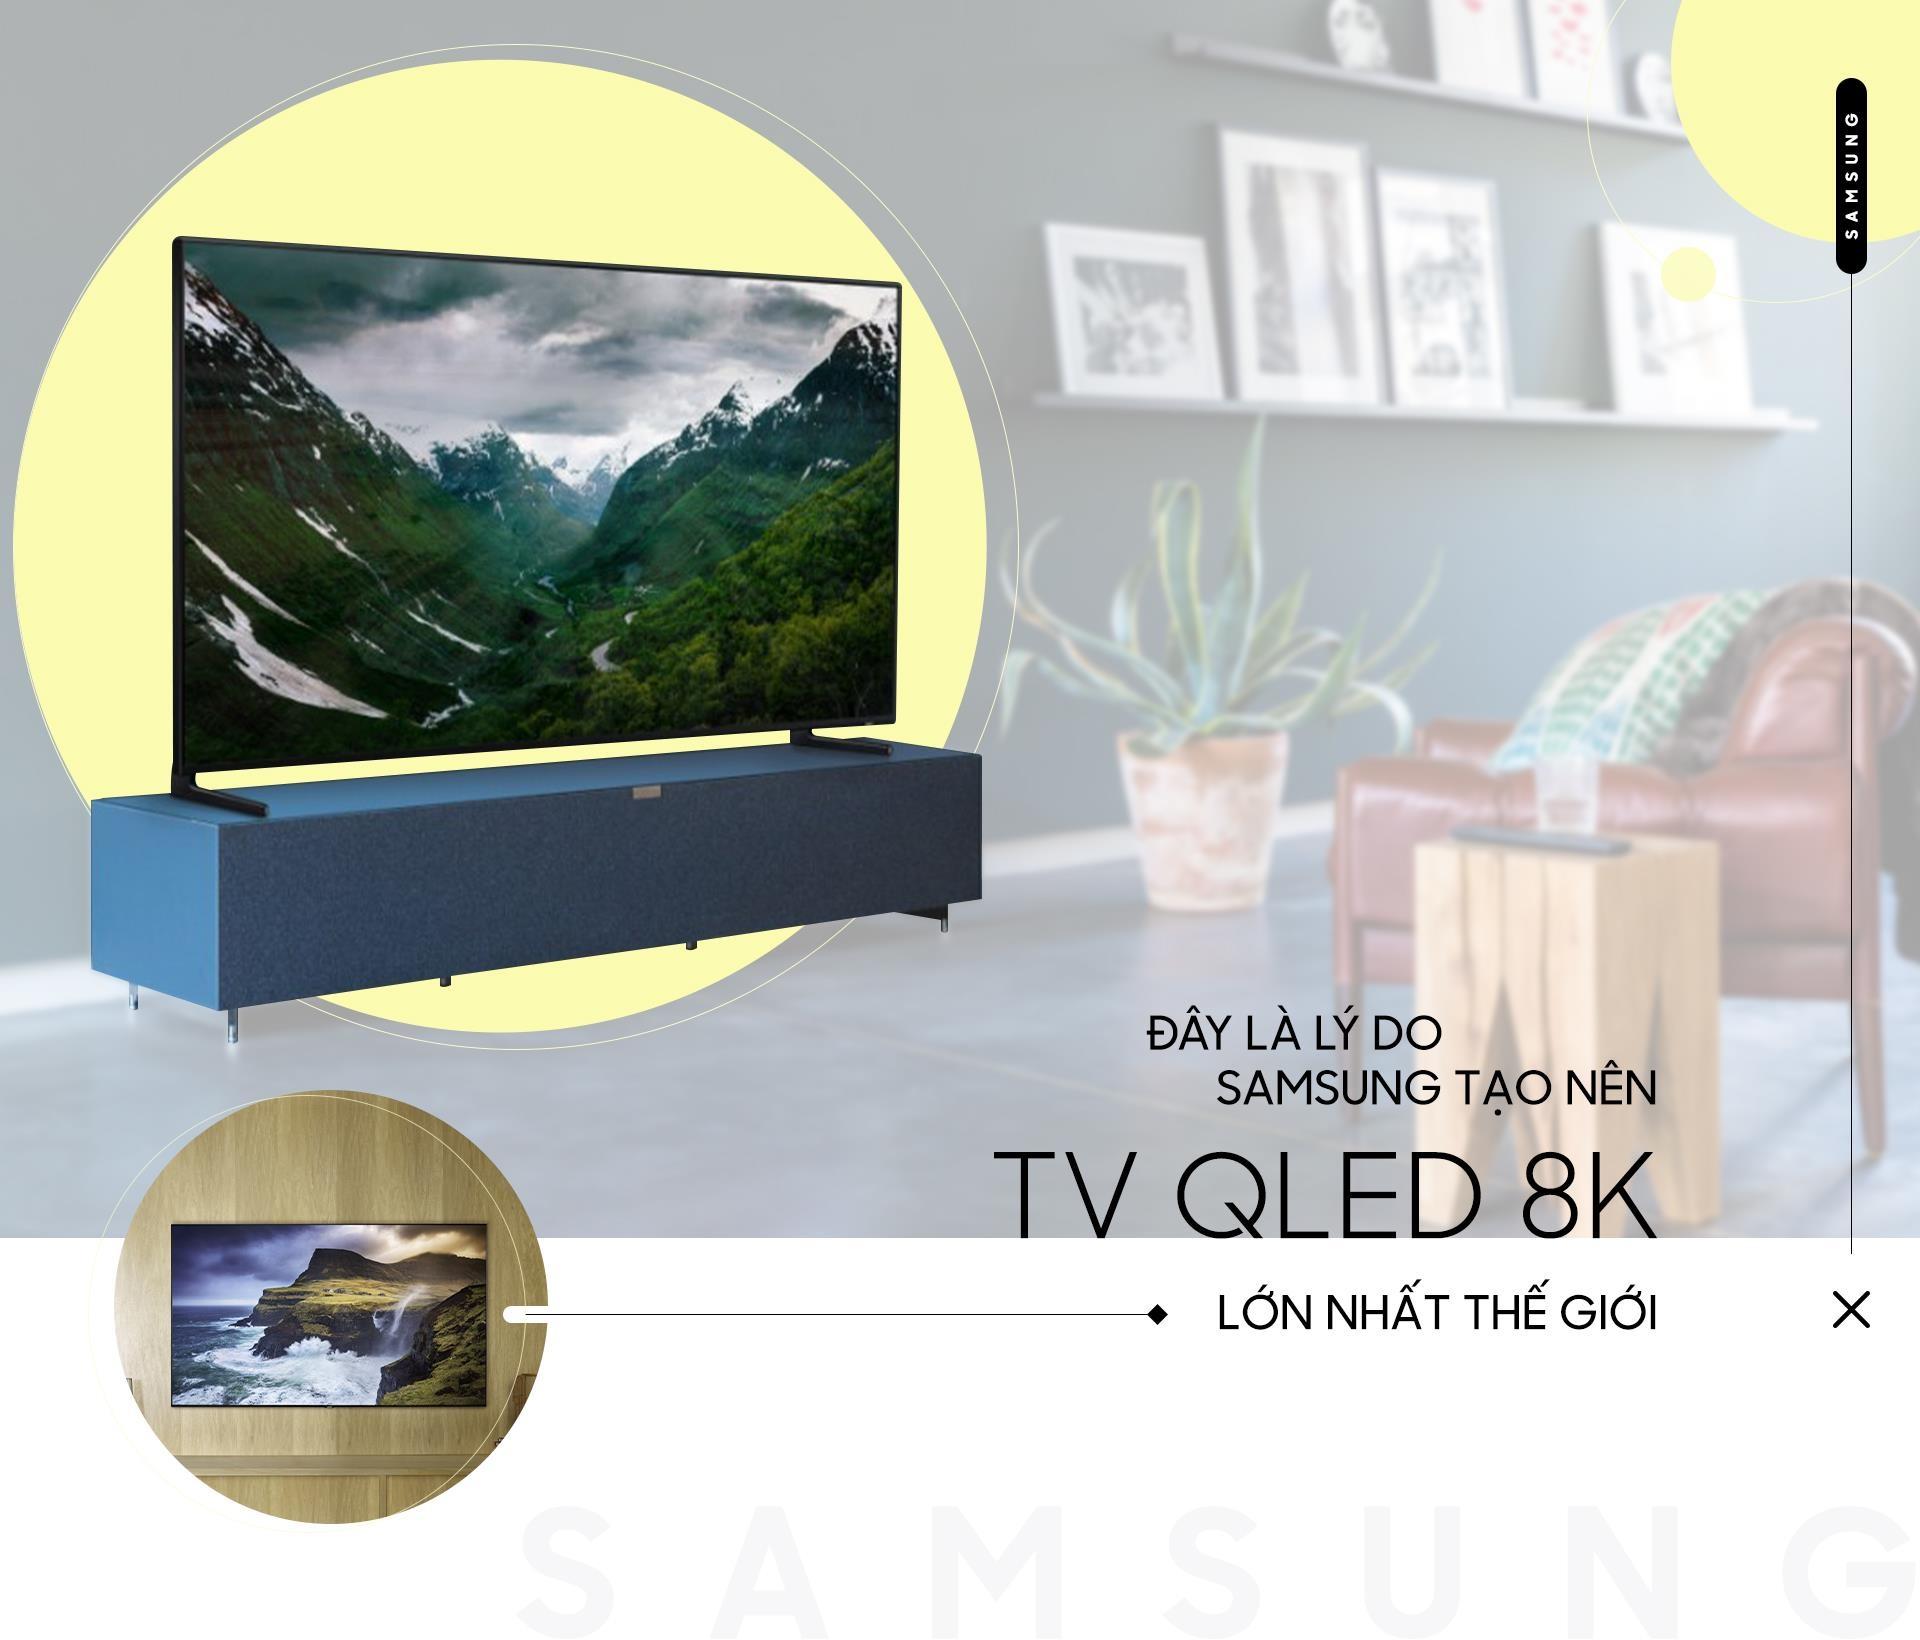 Day la ly do Samsung tao nen TV QLED 8K lon nhat the gioi hinh anh 2